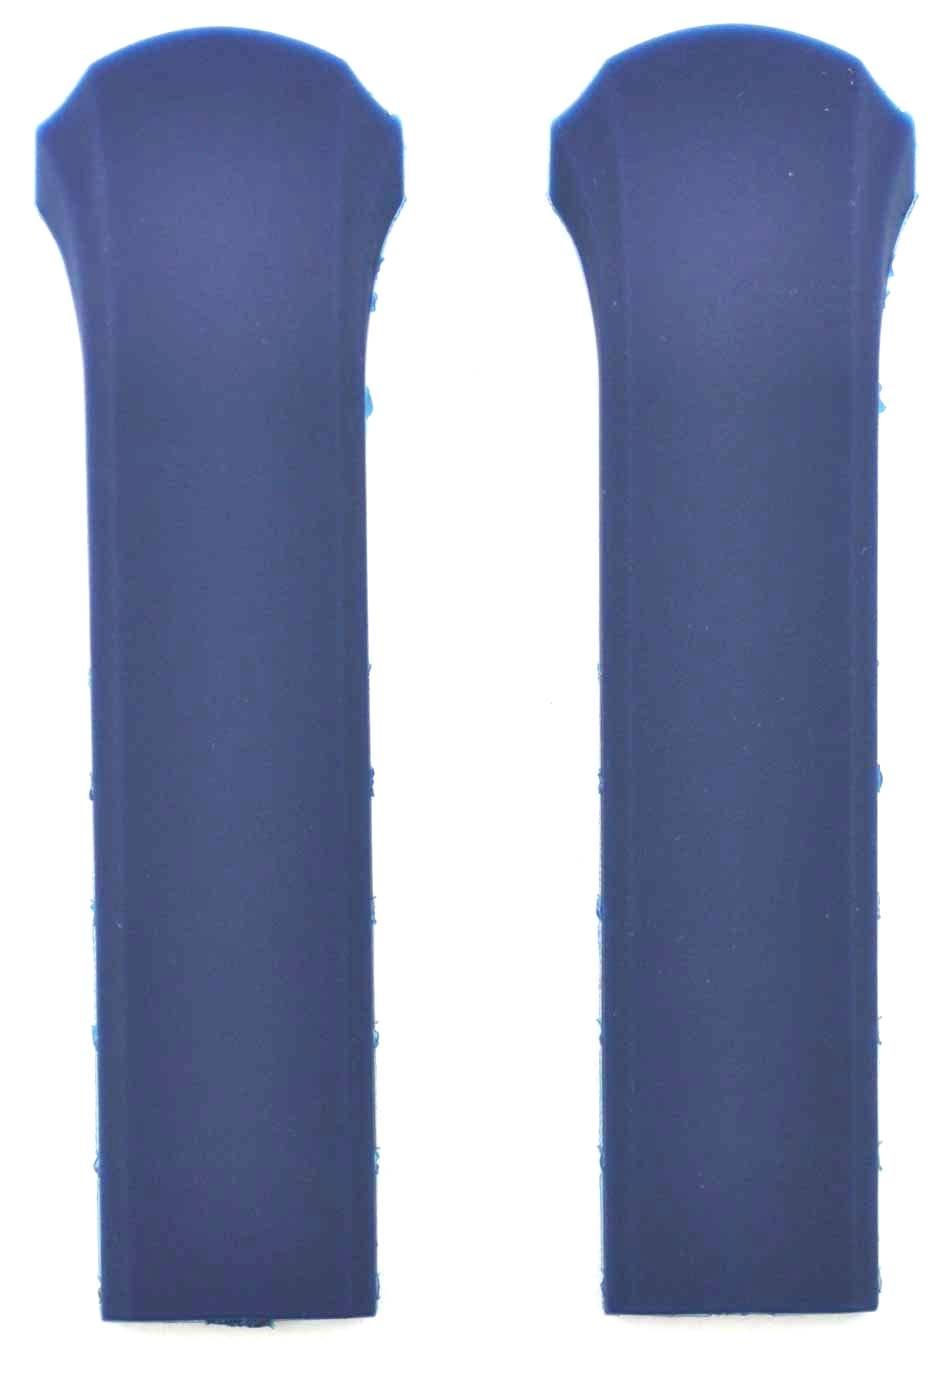 212ZTD Blauw Rubber Horloge Band Compatibel Met Tissot T-Tracx Ijshockey T010417A T0104171705700 26Mm 281TST